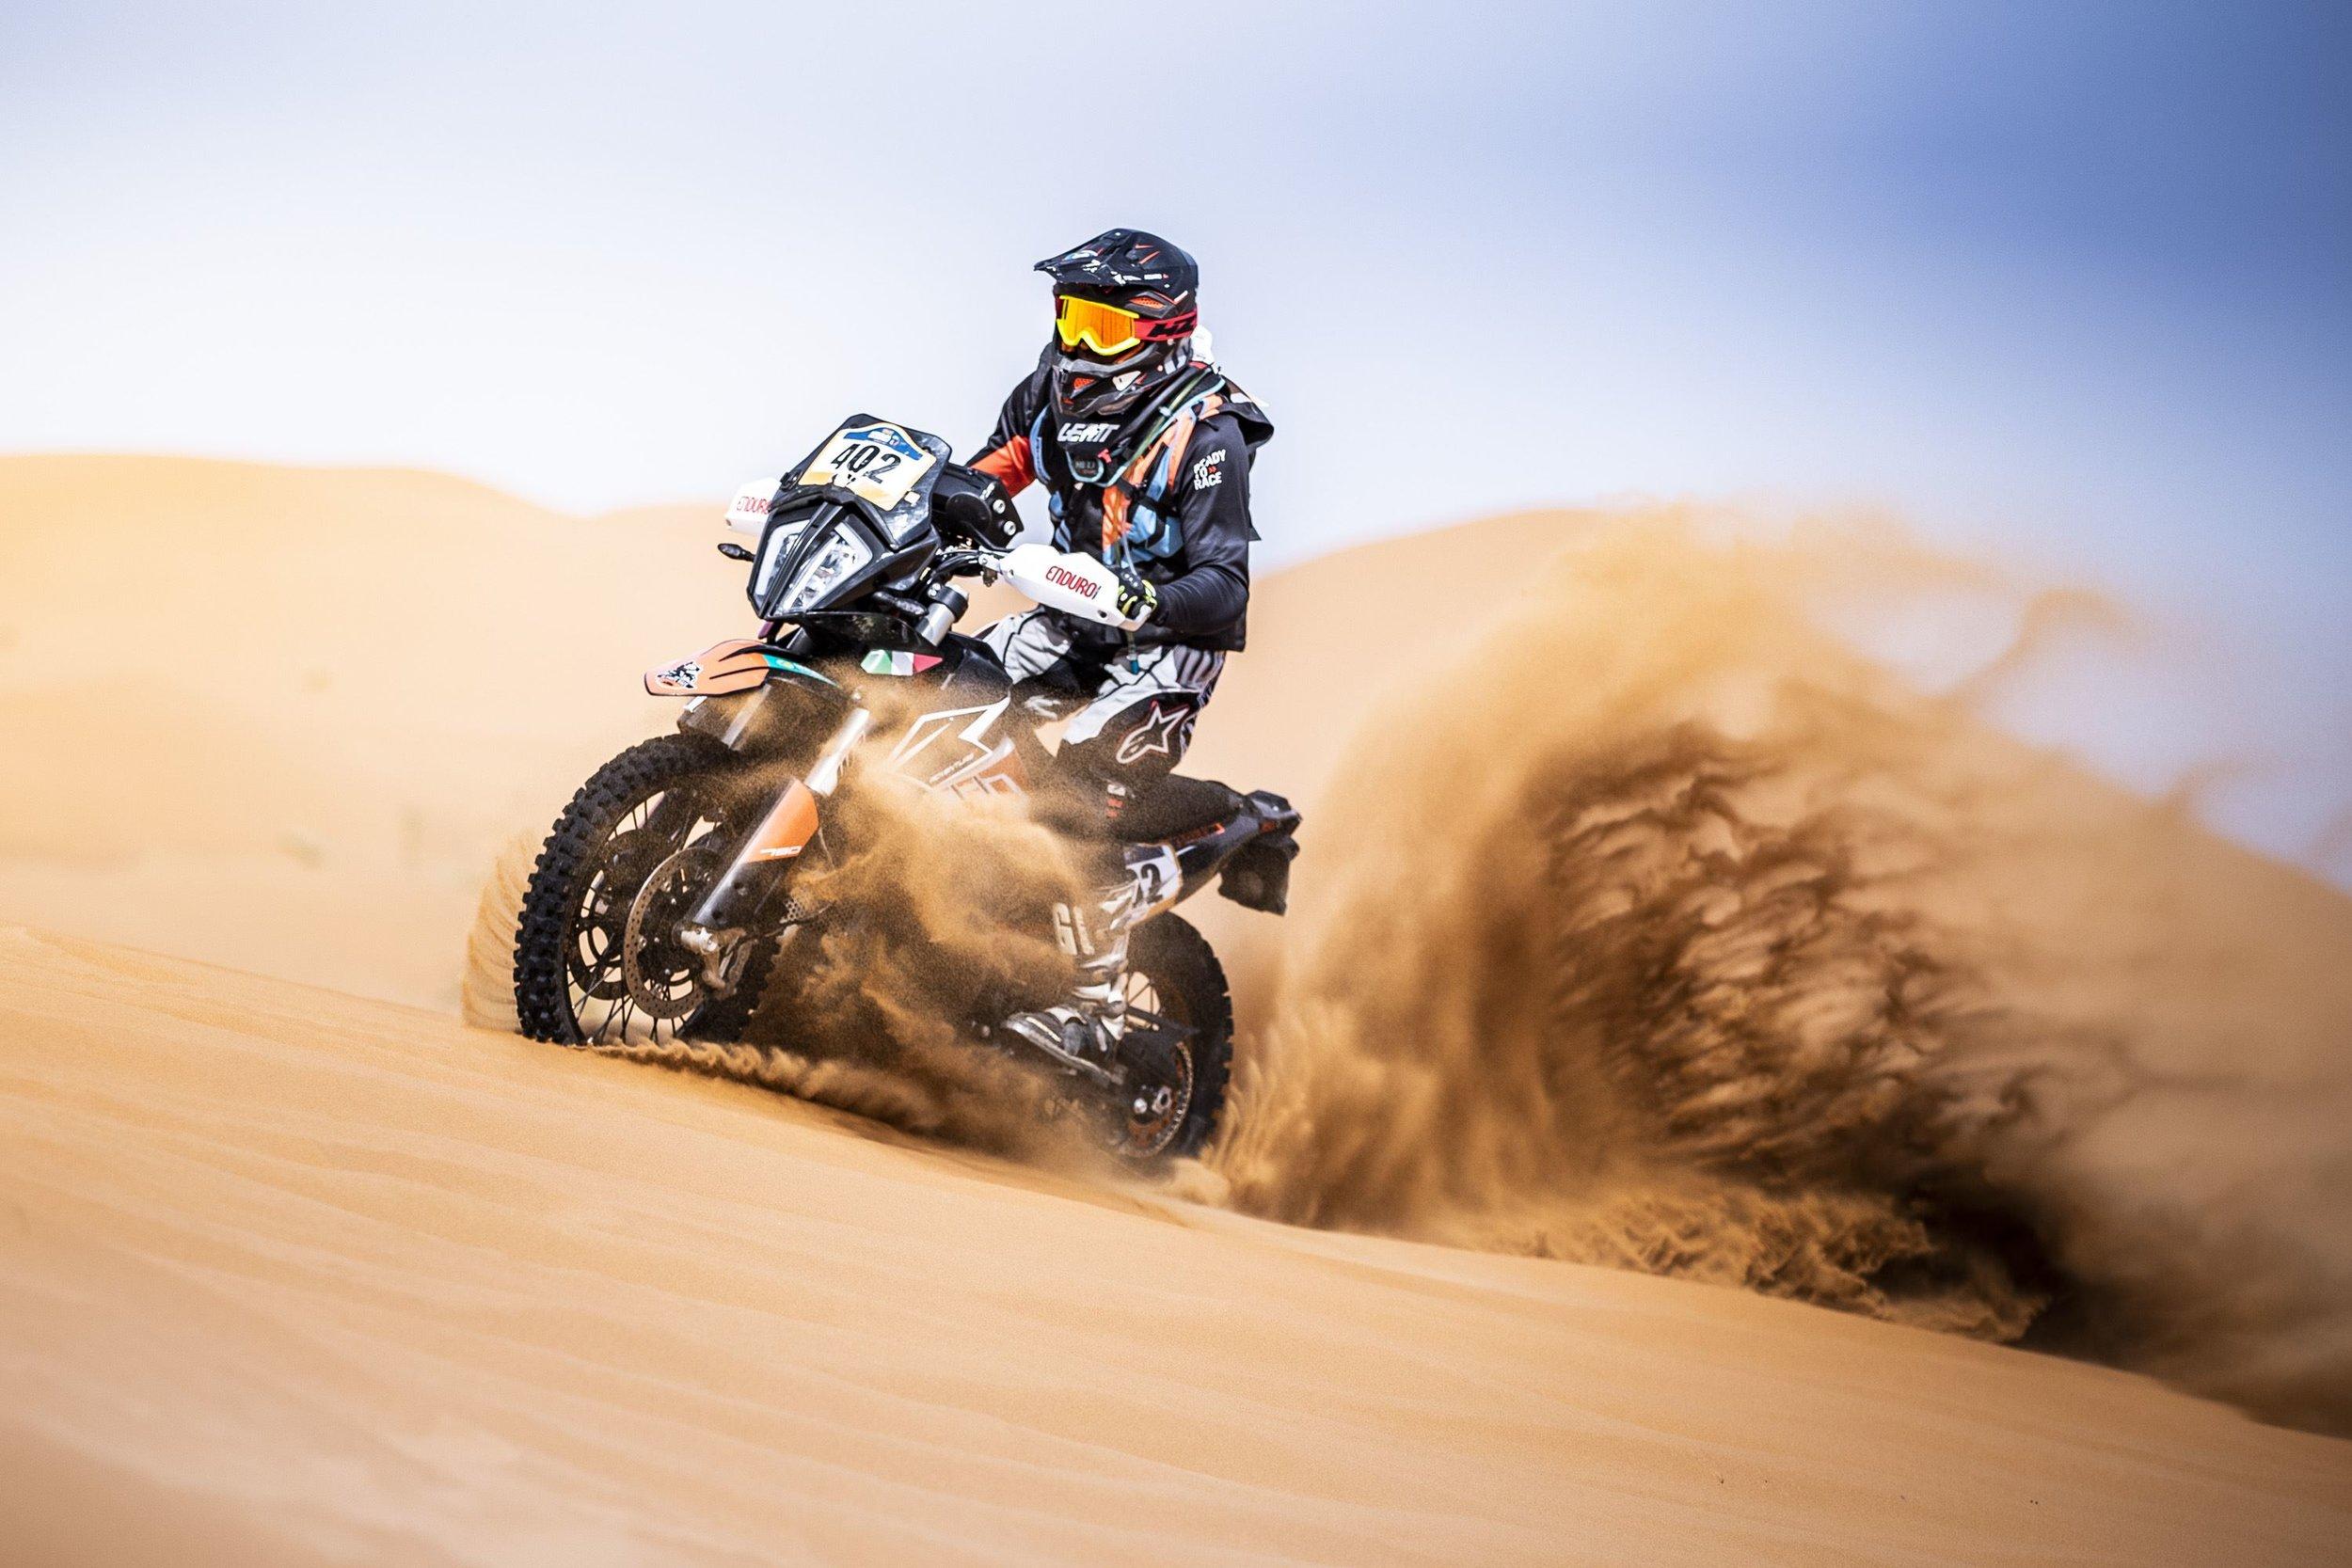 Sassaro KTM 790 ADVENTURE R_KTM Ultimate Race 2019.jpg